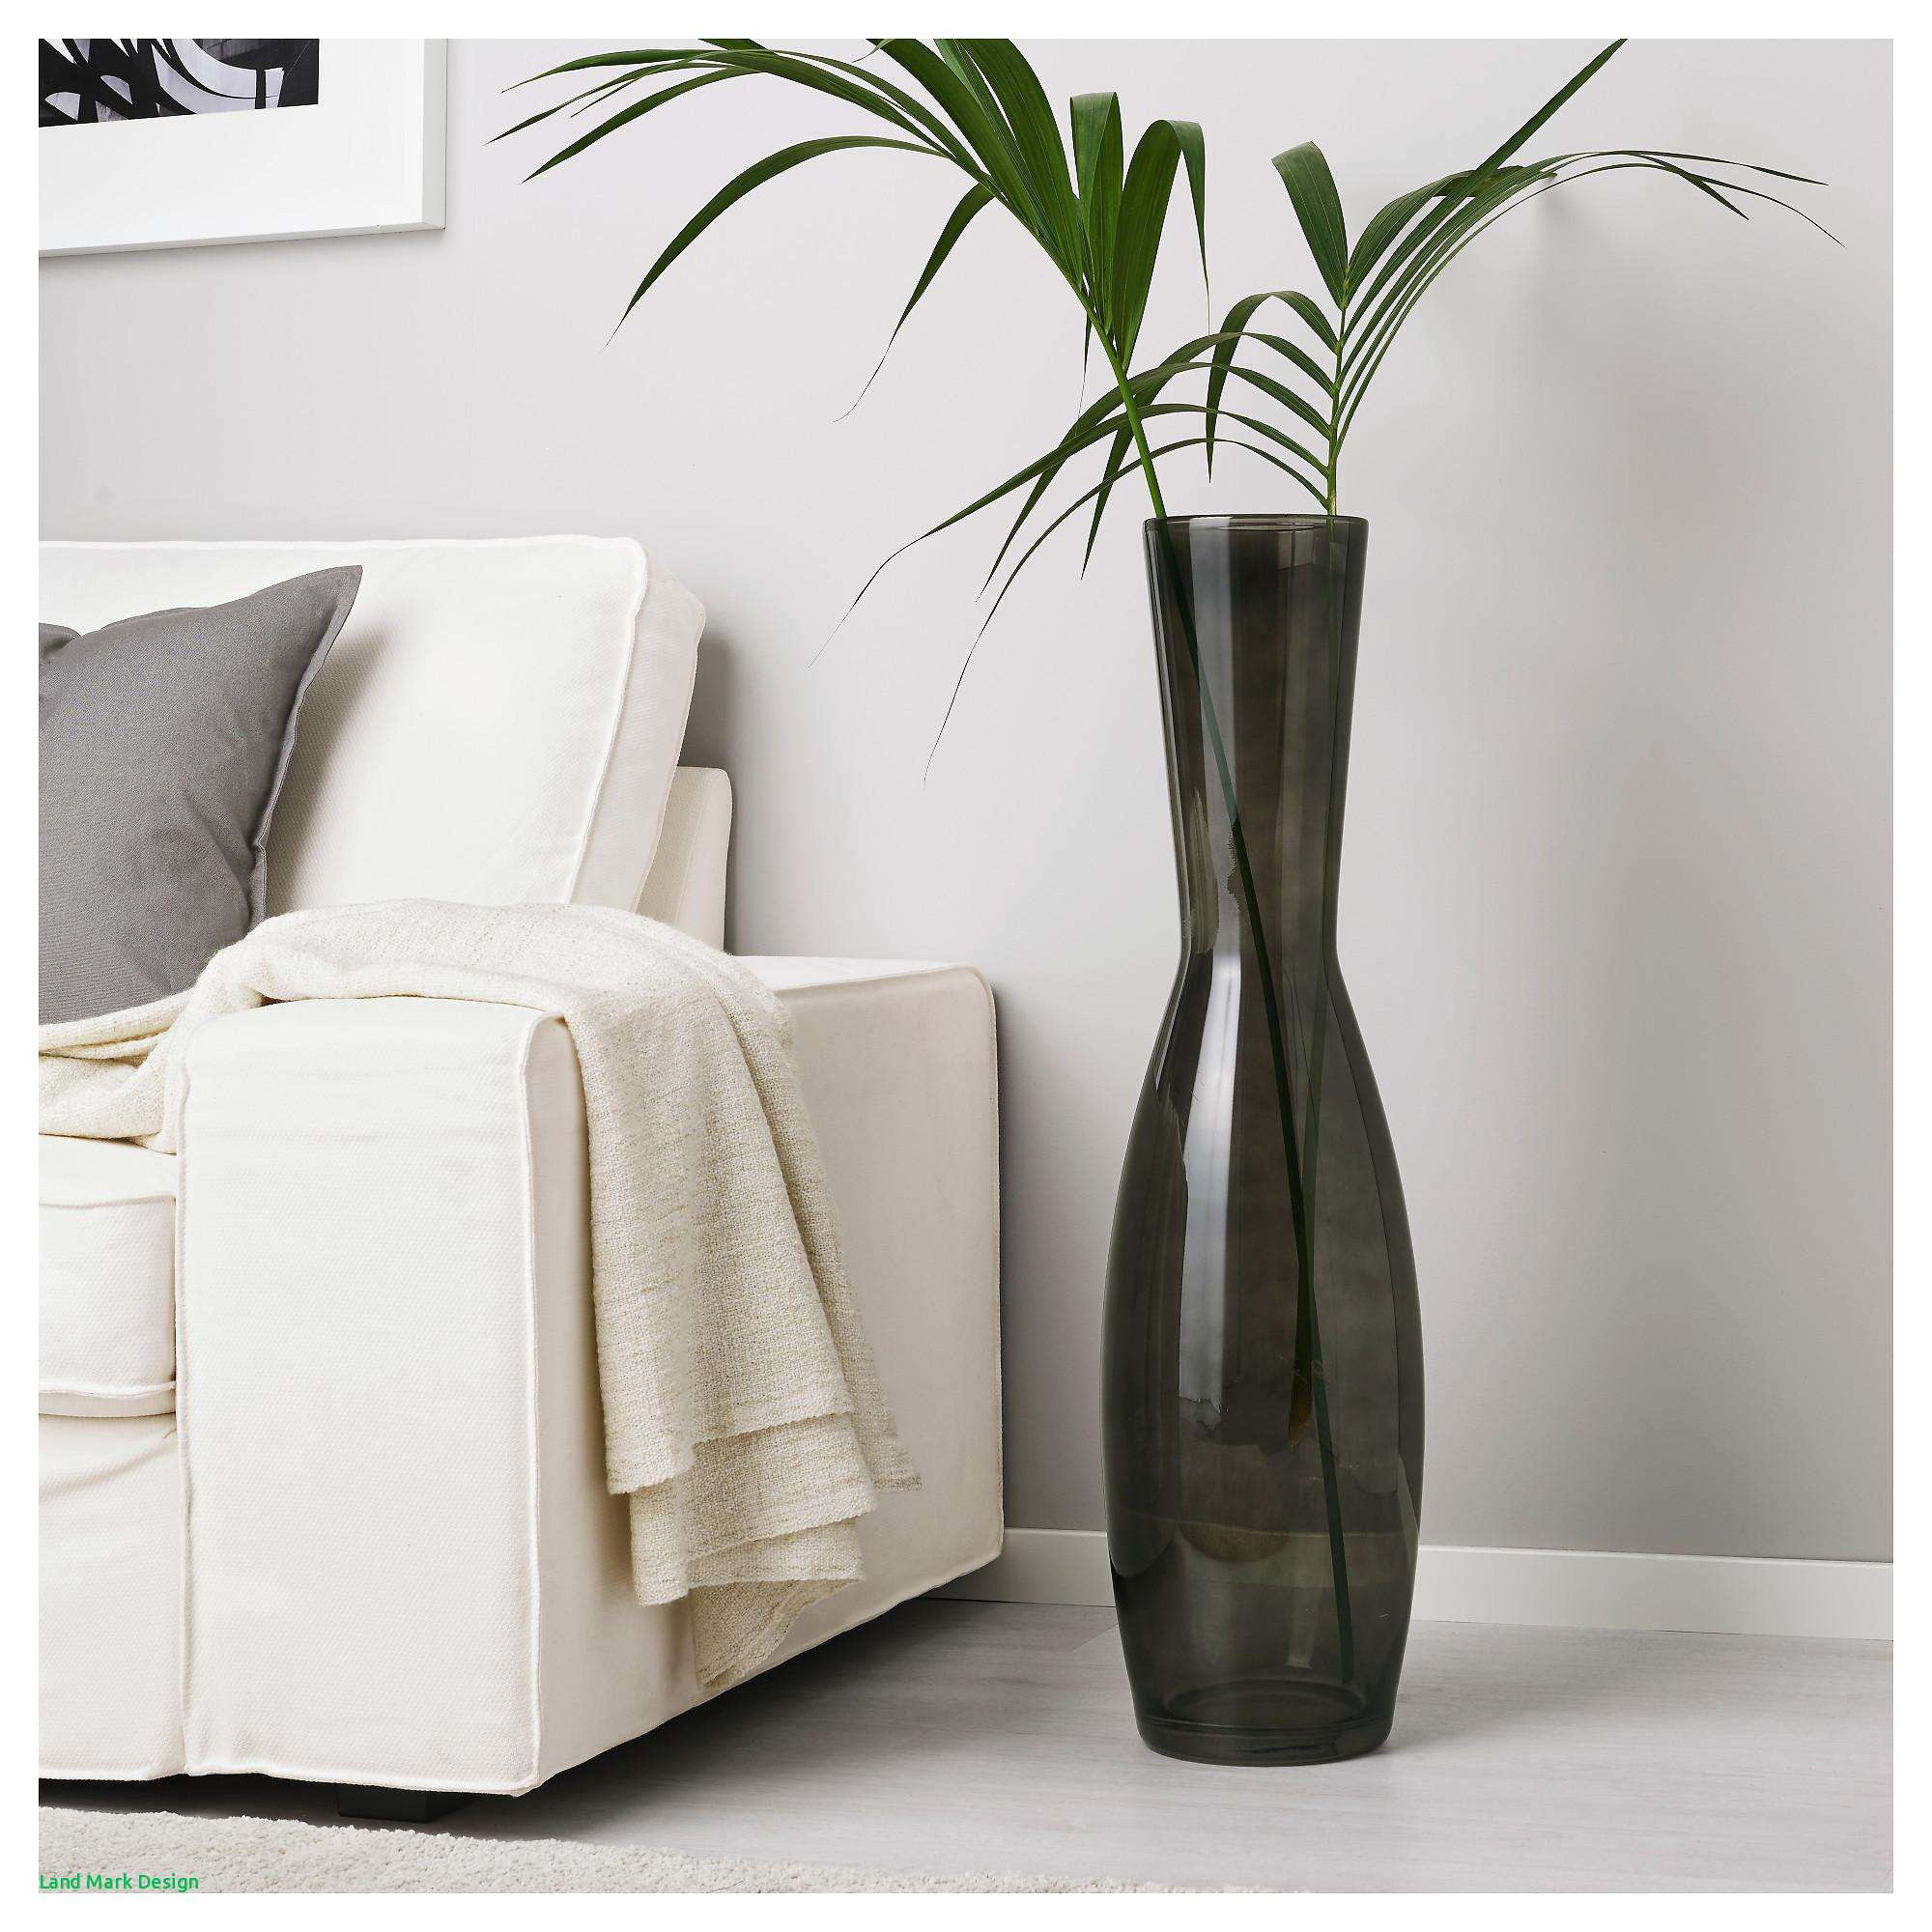 Large Indoor Floor Vases Of Ikea Floor Vases Design Home Design with Regard to Full Size Of Living Room Concrete Vases Inspirational Ikea Floor Vases Tall Large Size Of Living